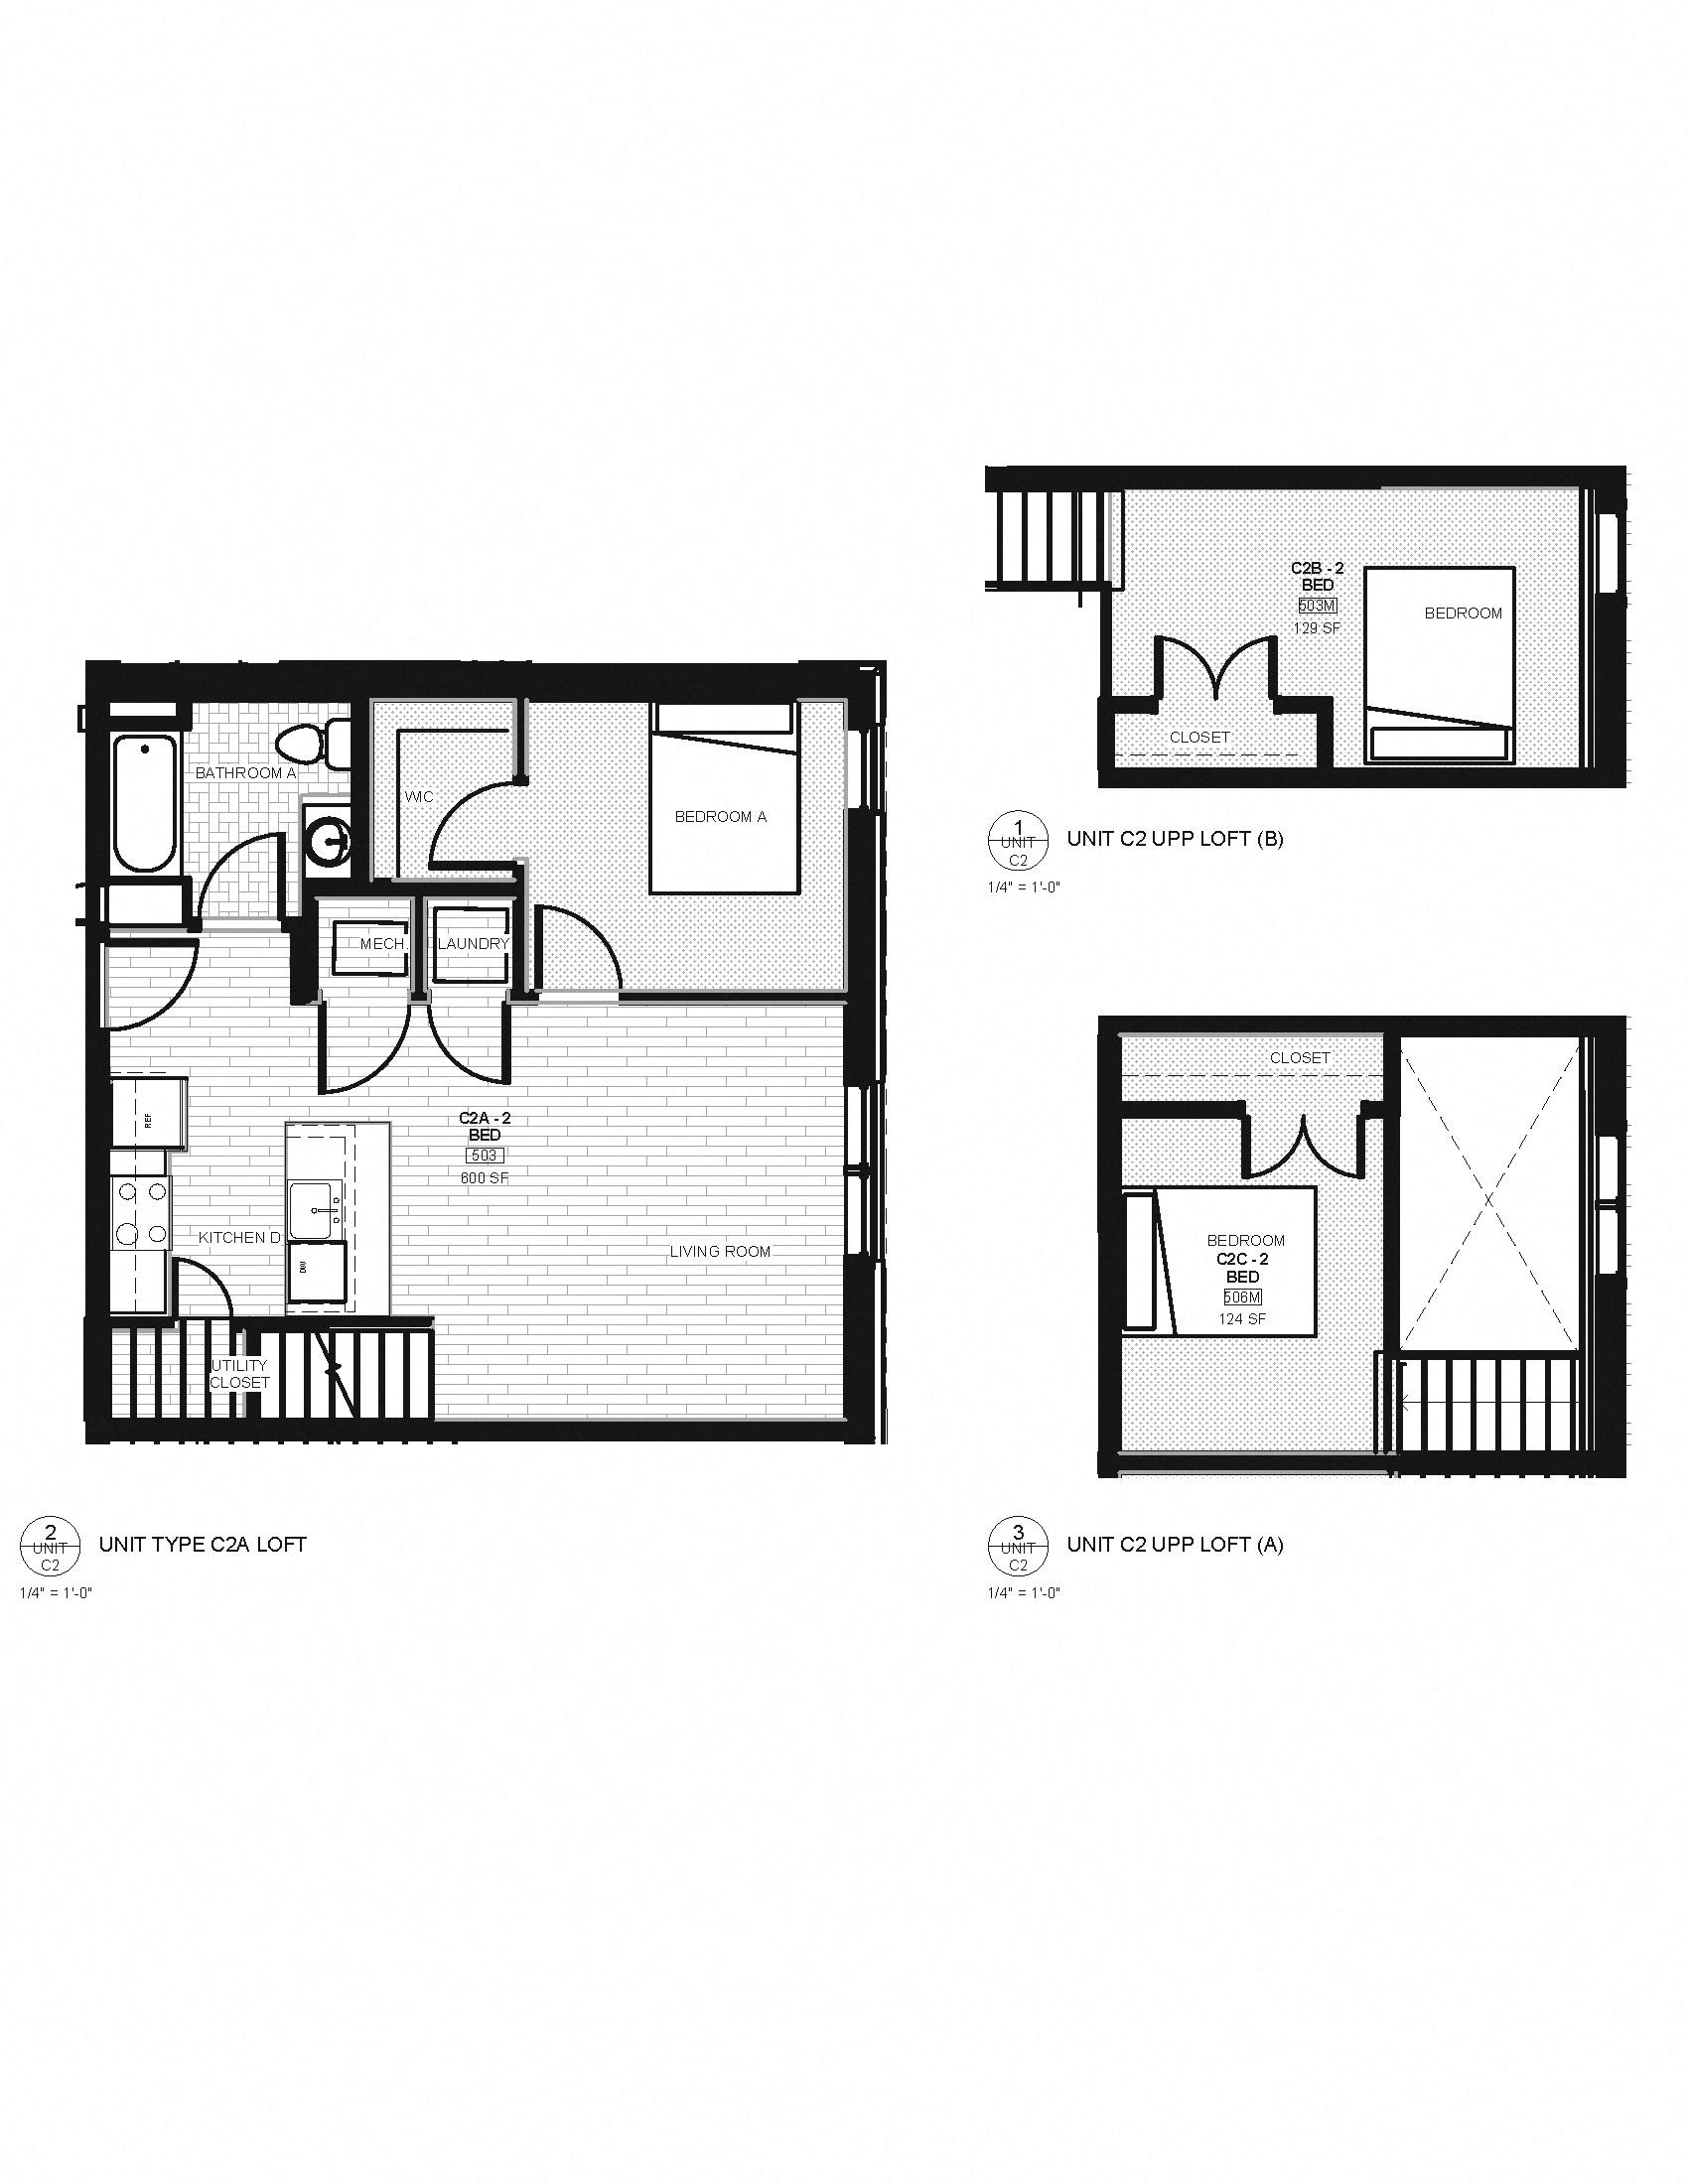 loft bed diagram